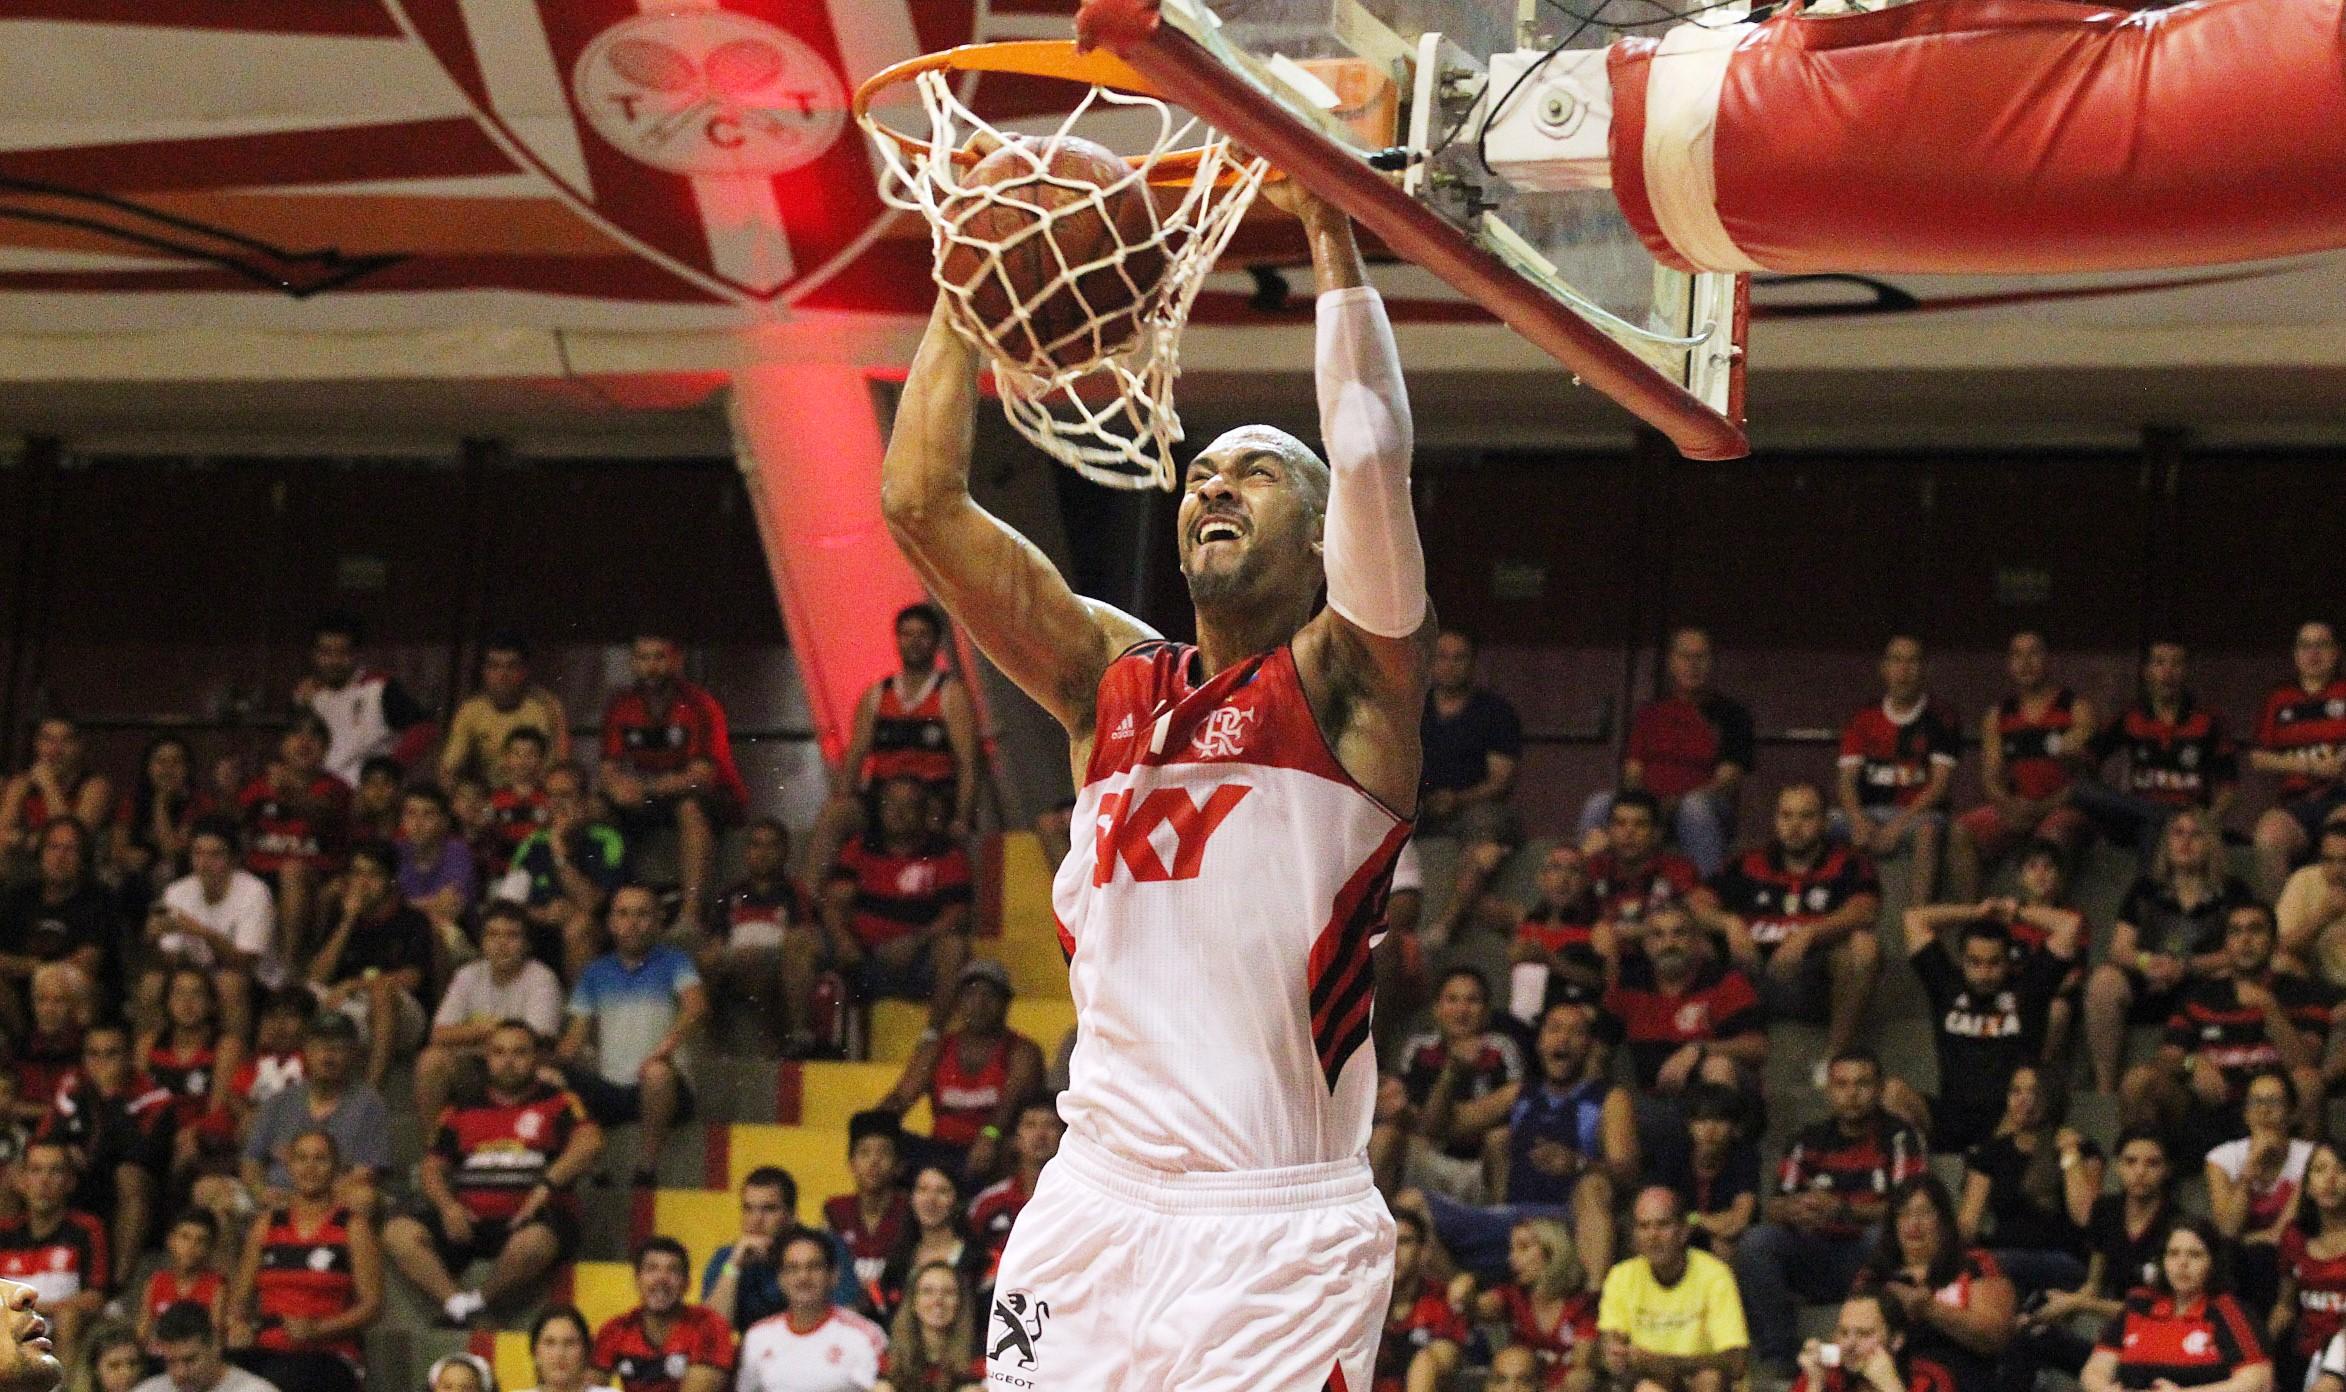 basquete Fla x sao jose_23_abr_15